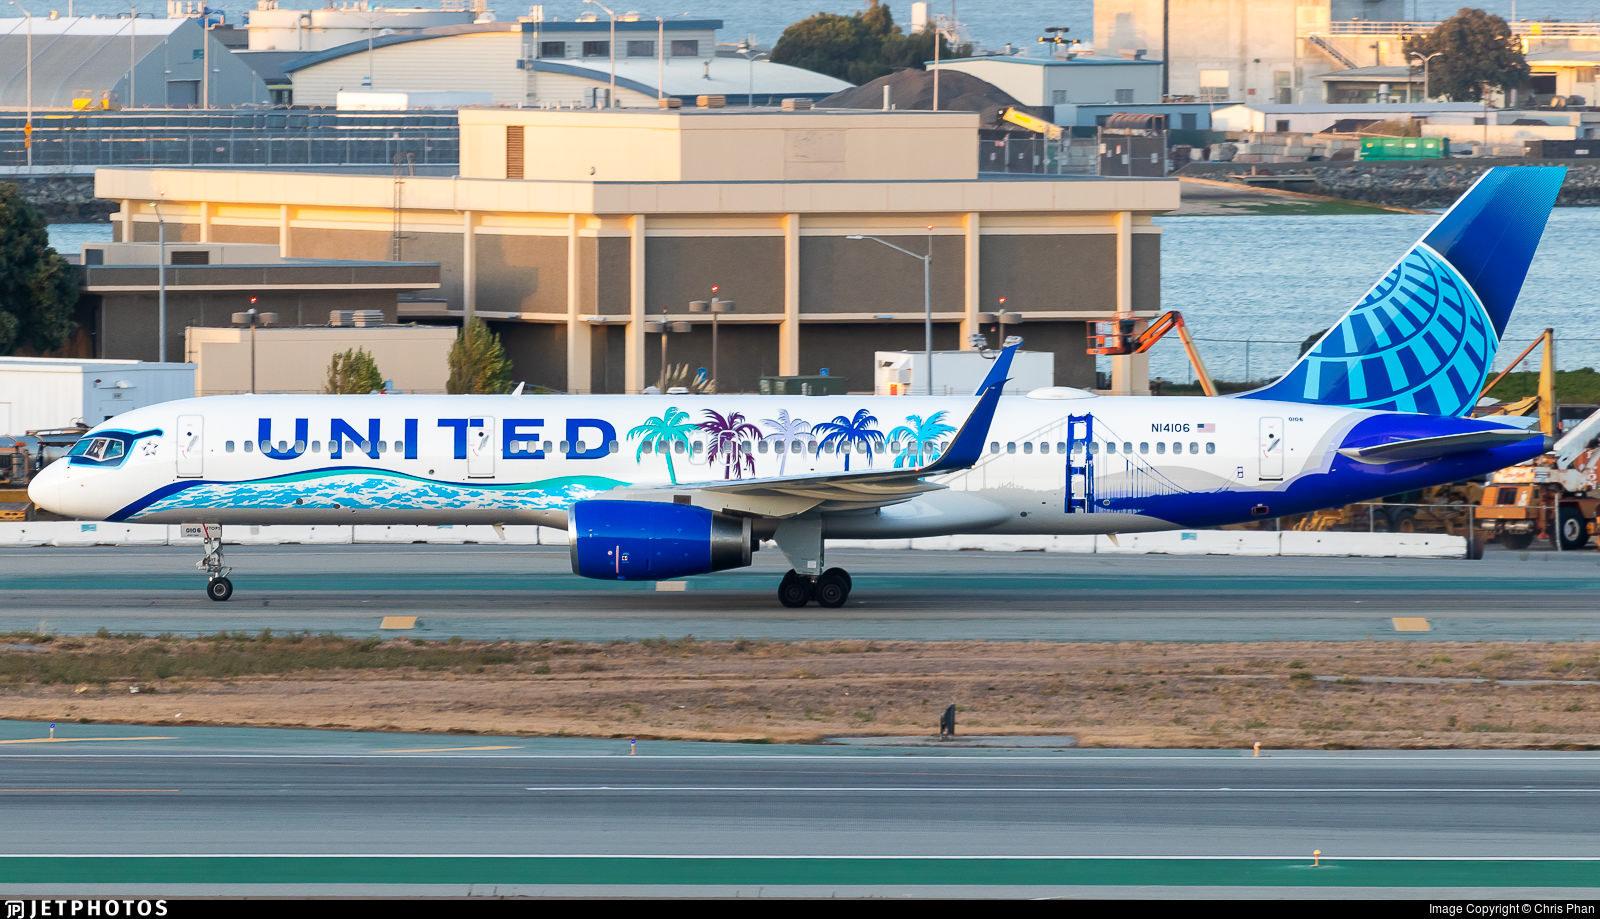 United's California-themed Her Art Here 757